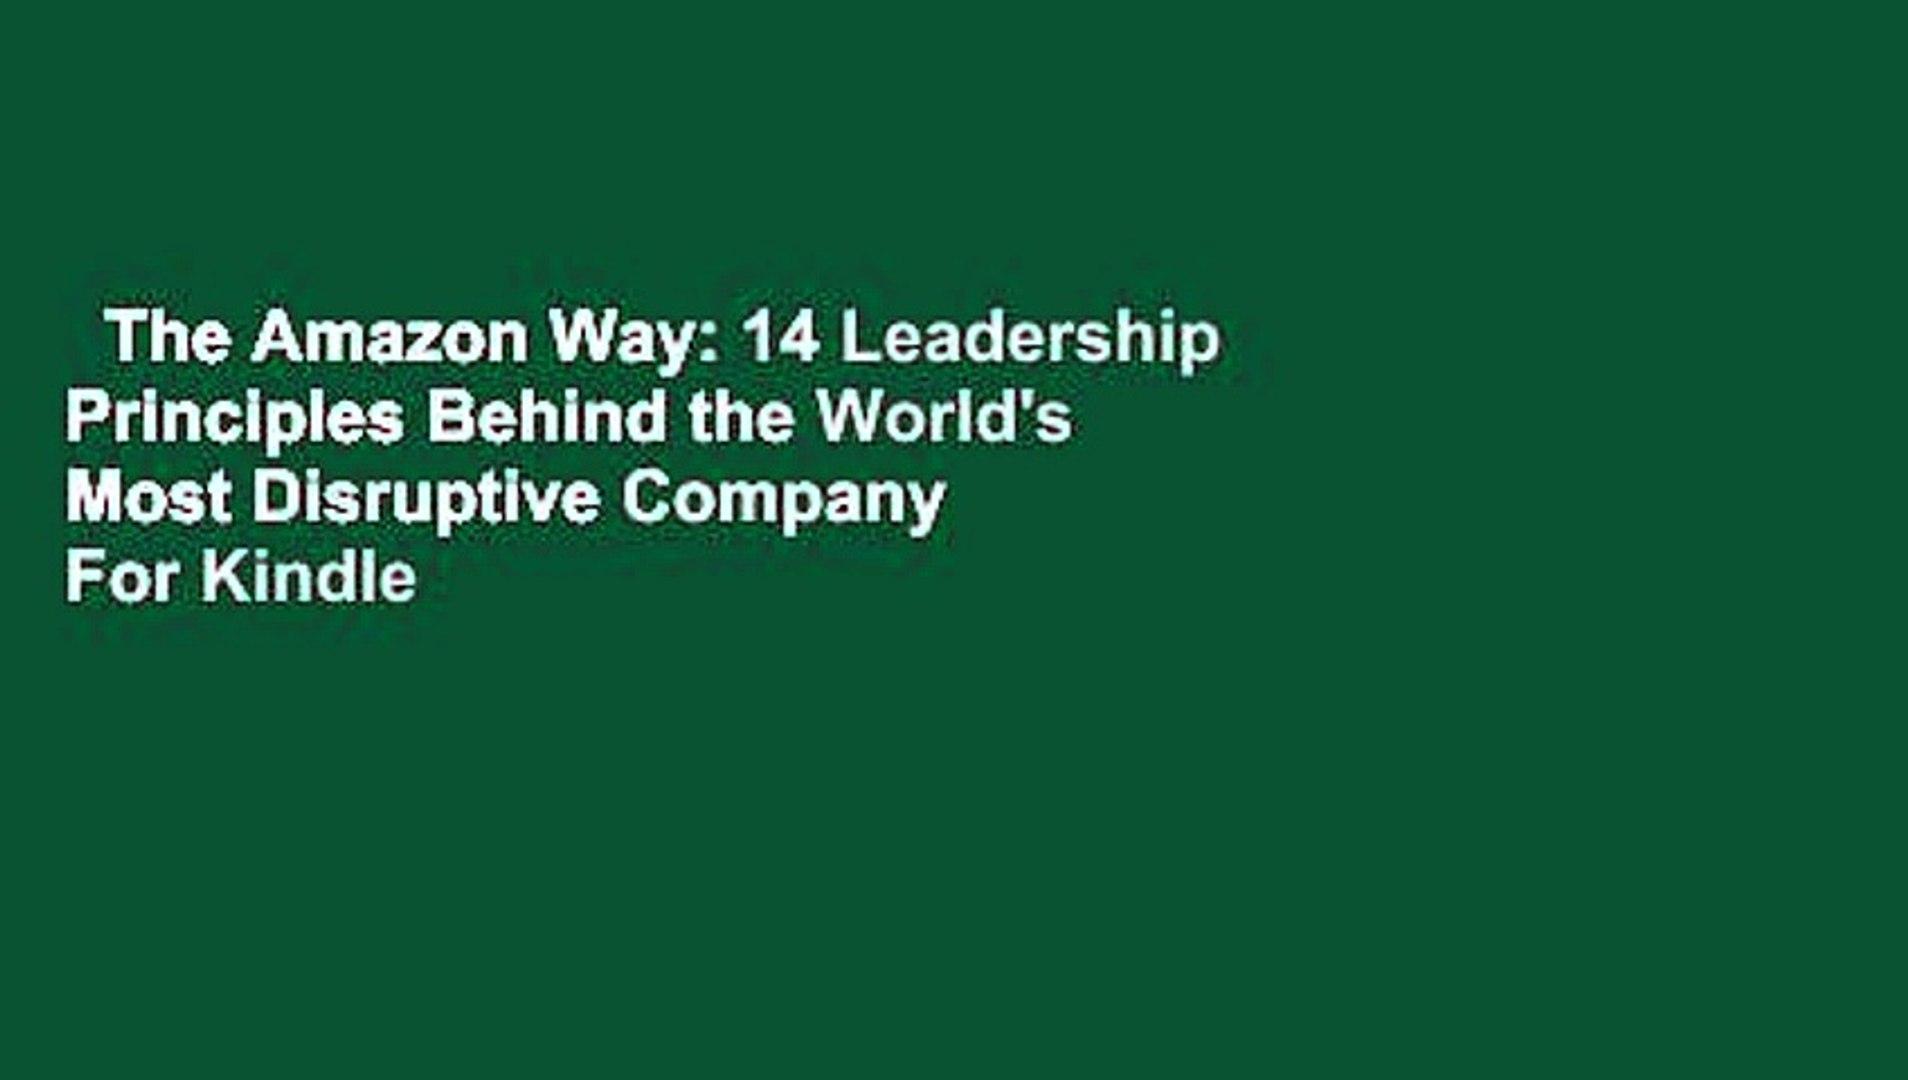 The Amazon Way: 14 Leadership Principles Behind the Worlds Most Disruptive Company